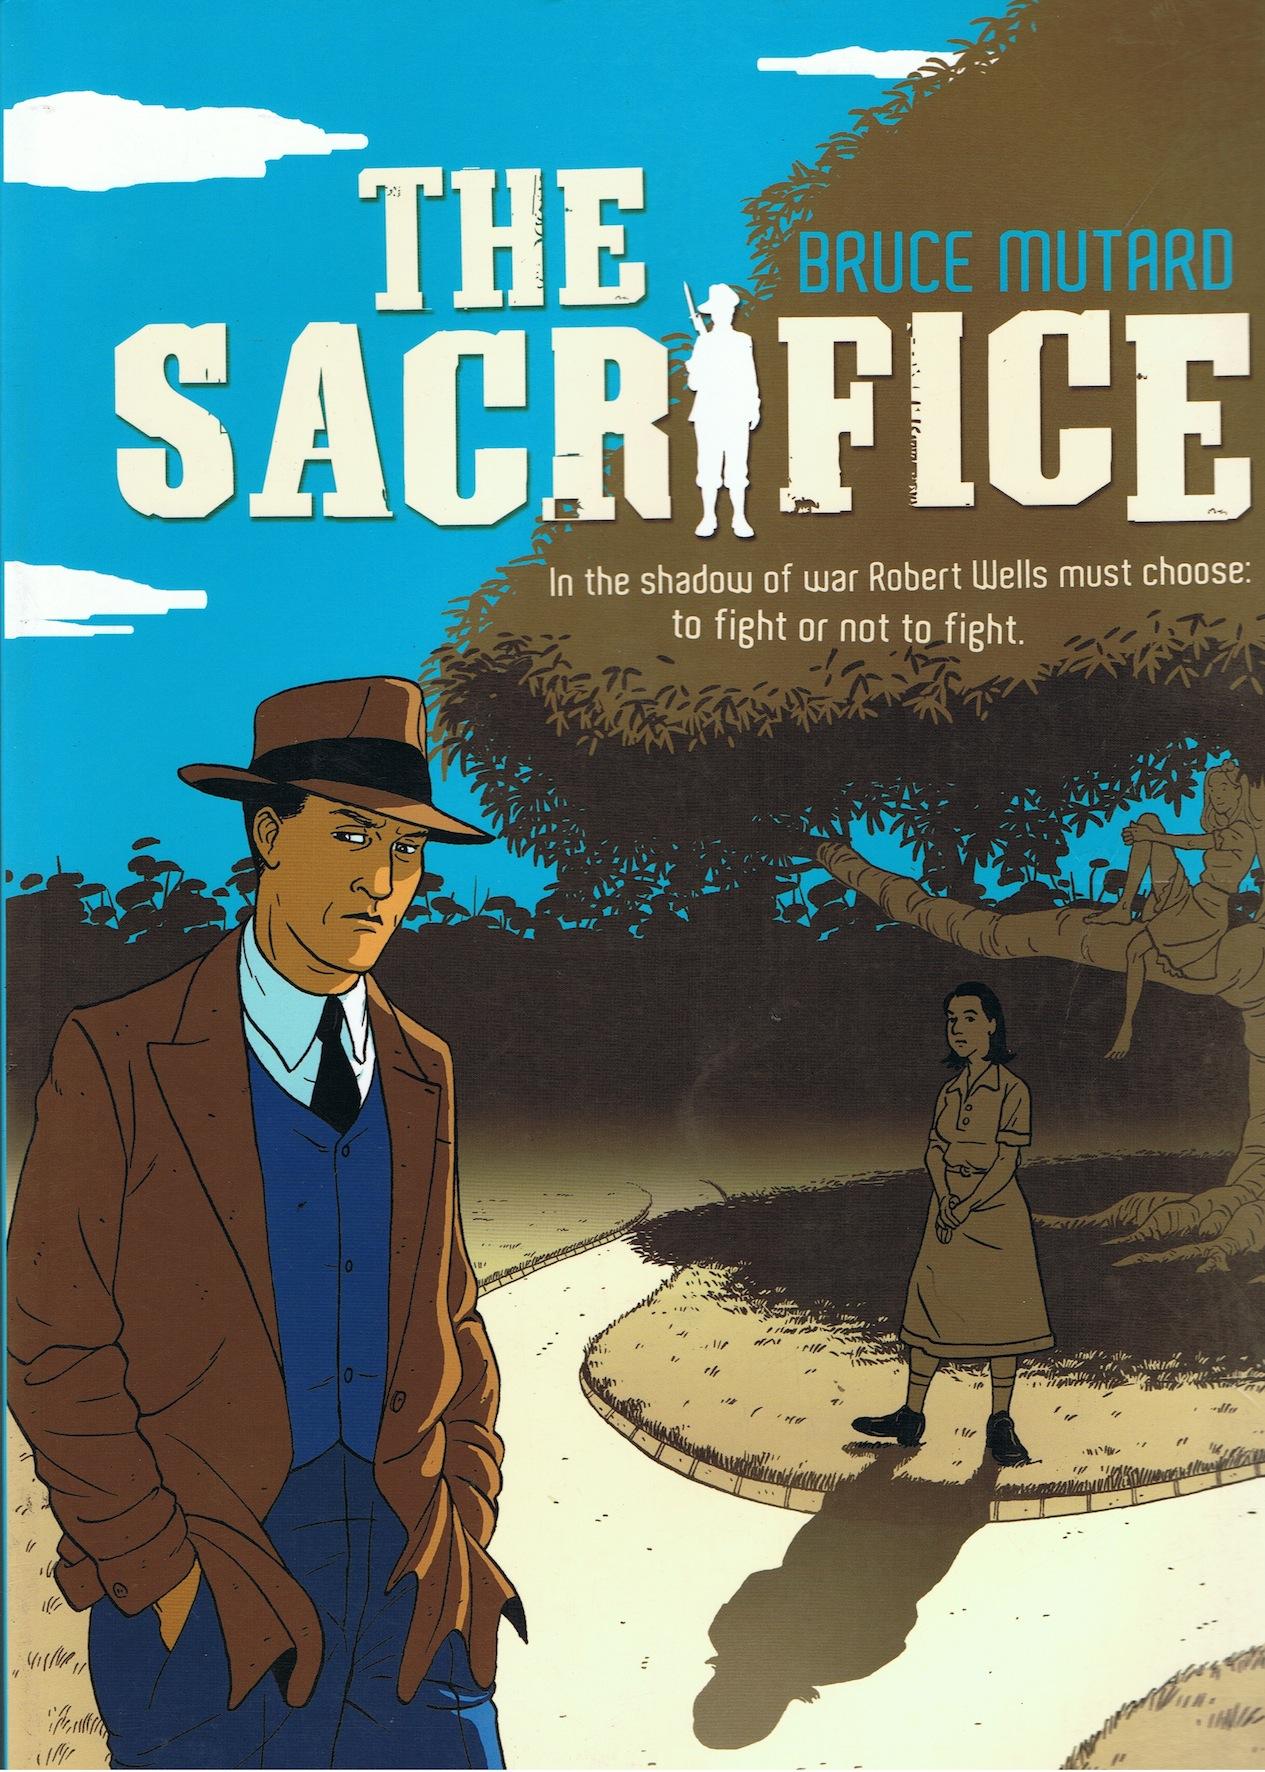 The Sacrifice by Bruce Mutard